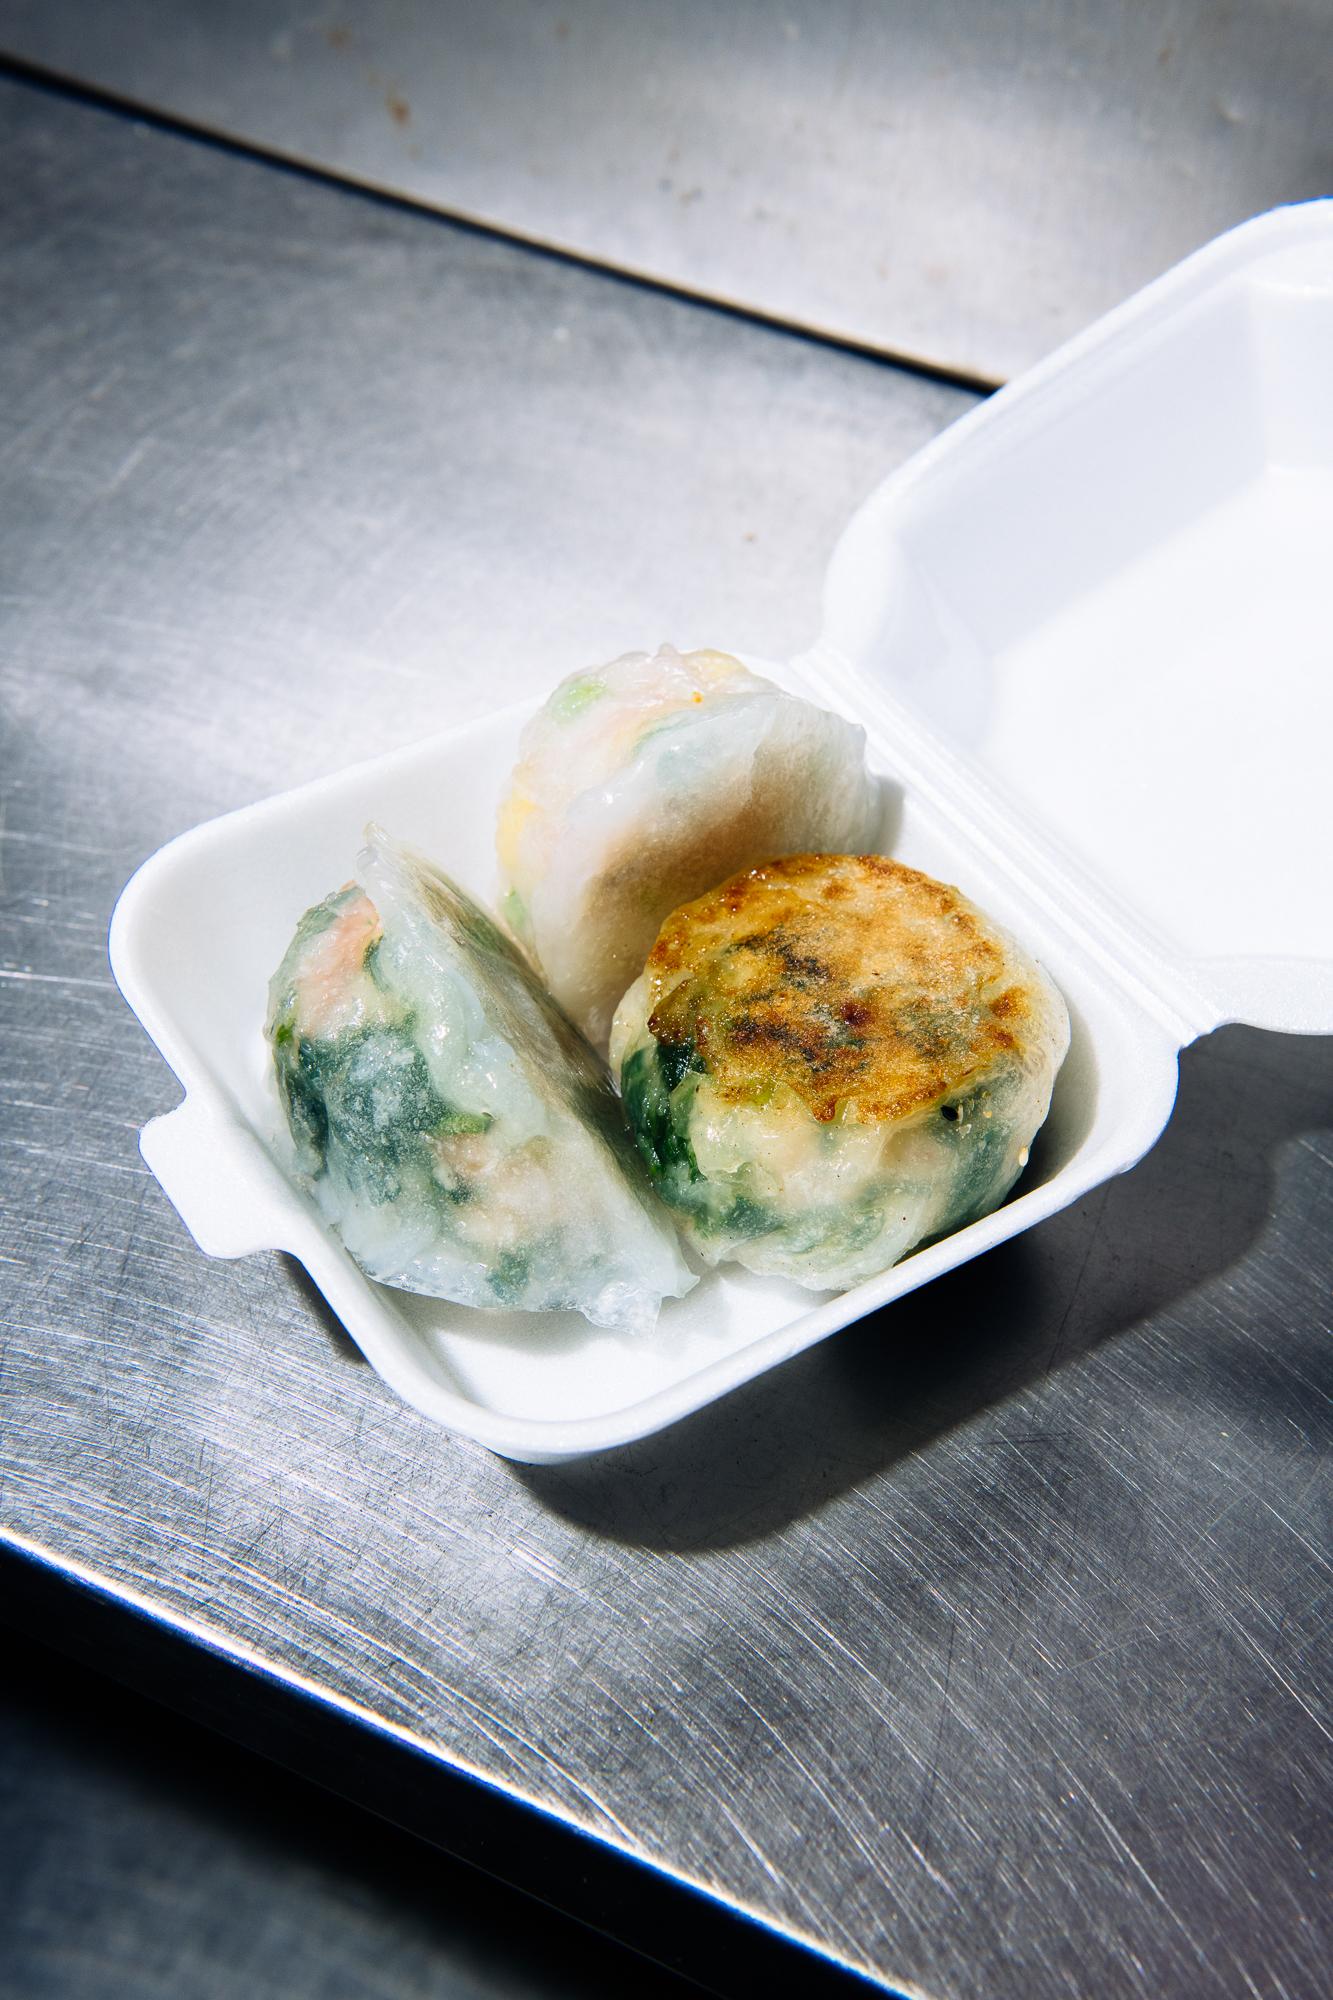 Crystal dumplings at Corner 28 in Flushing, Queens